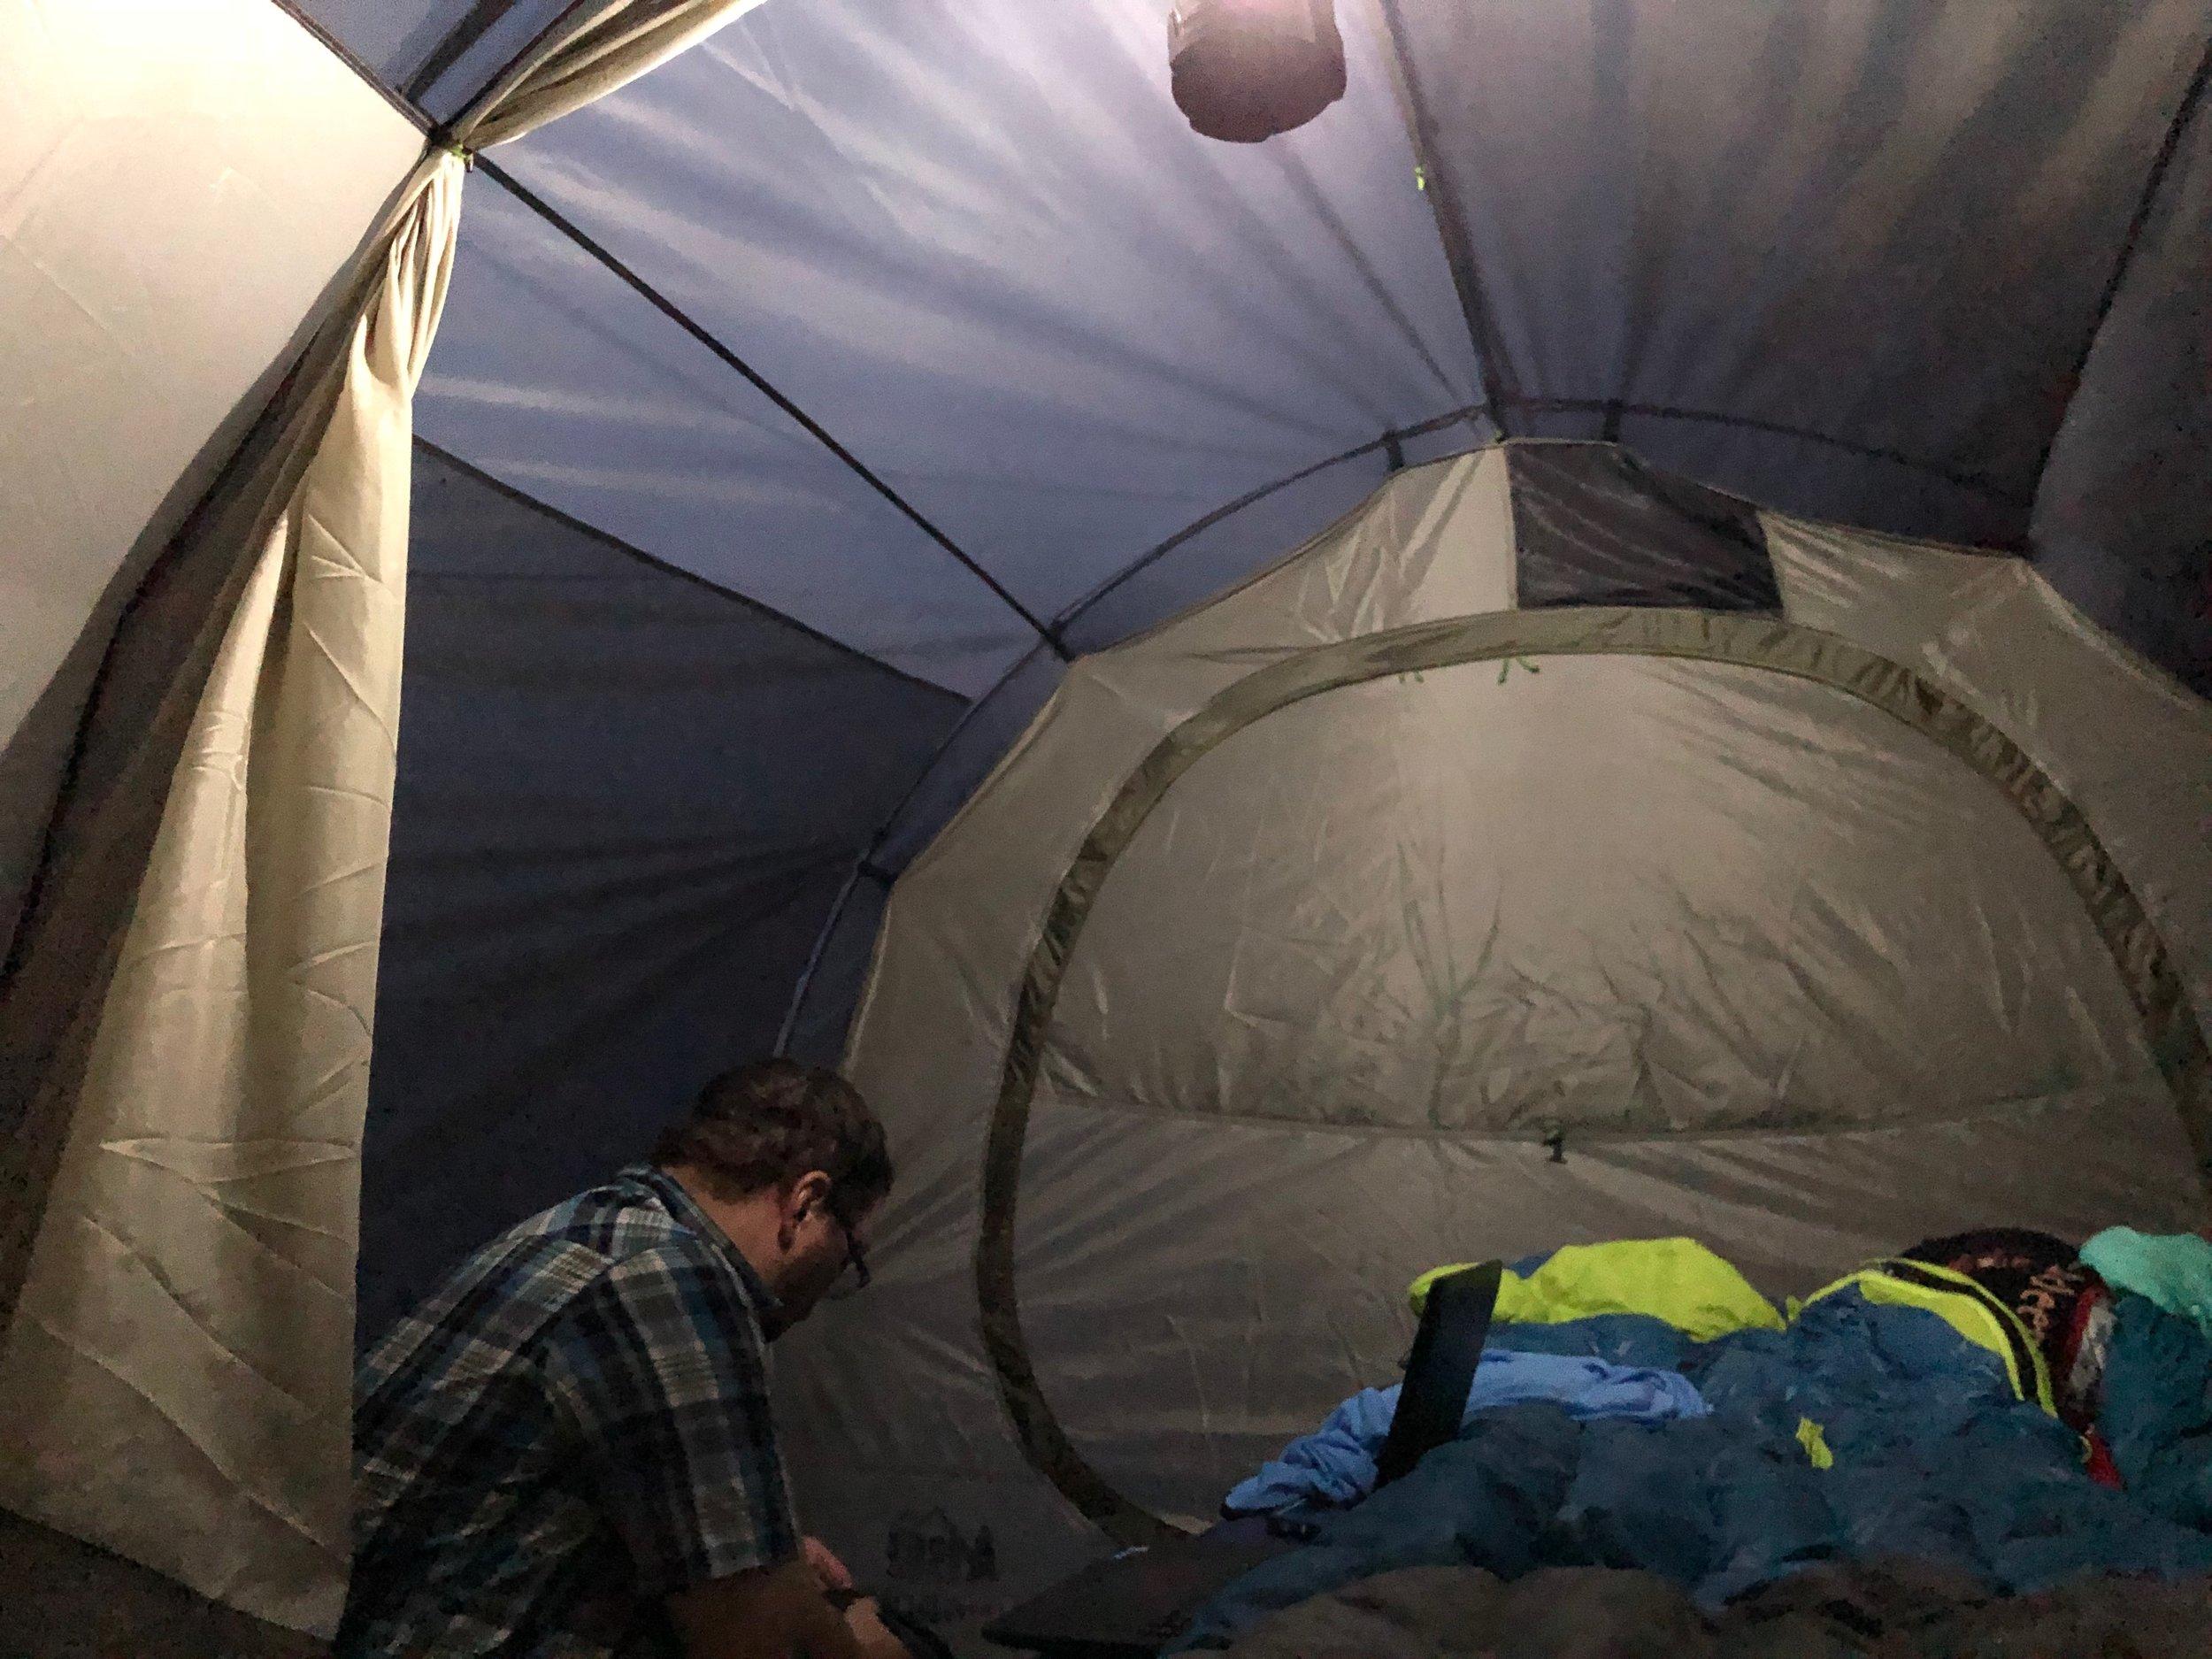 Inside view of REI Kingdom 6 tent.